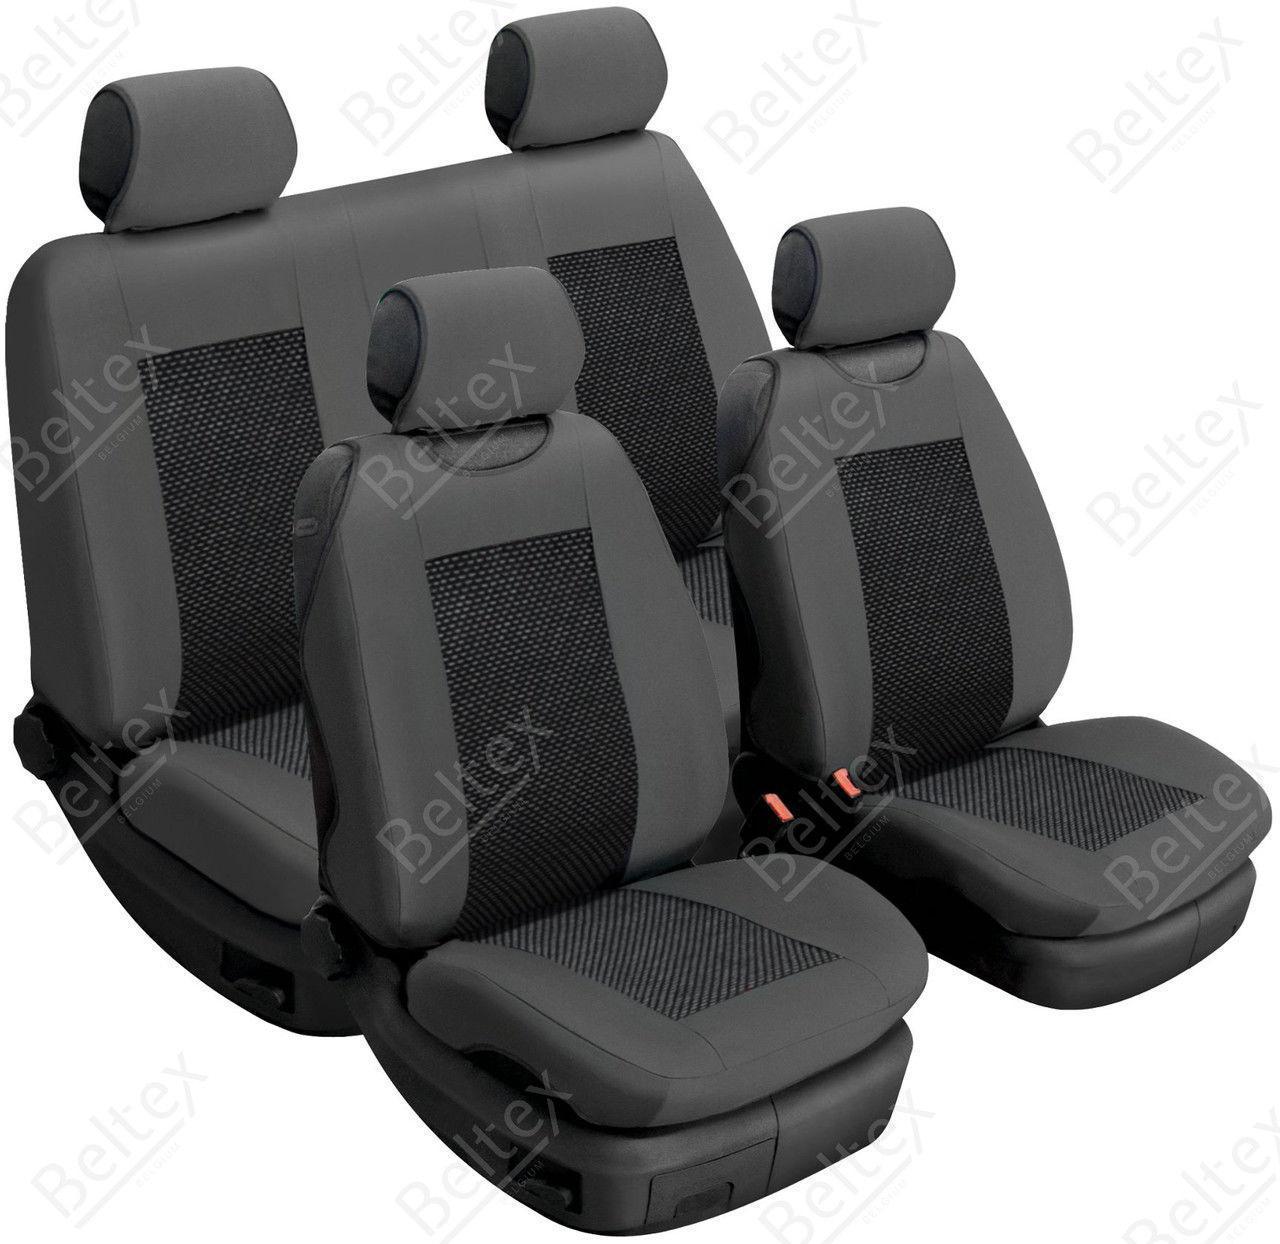 Майки/чехлы на сиденья Джип Гранд Чероки Лимитед (Jeep Grand Cherokee Limited)